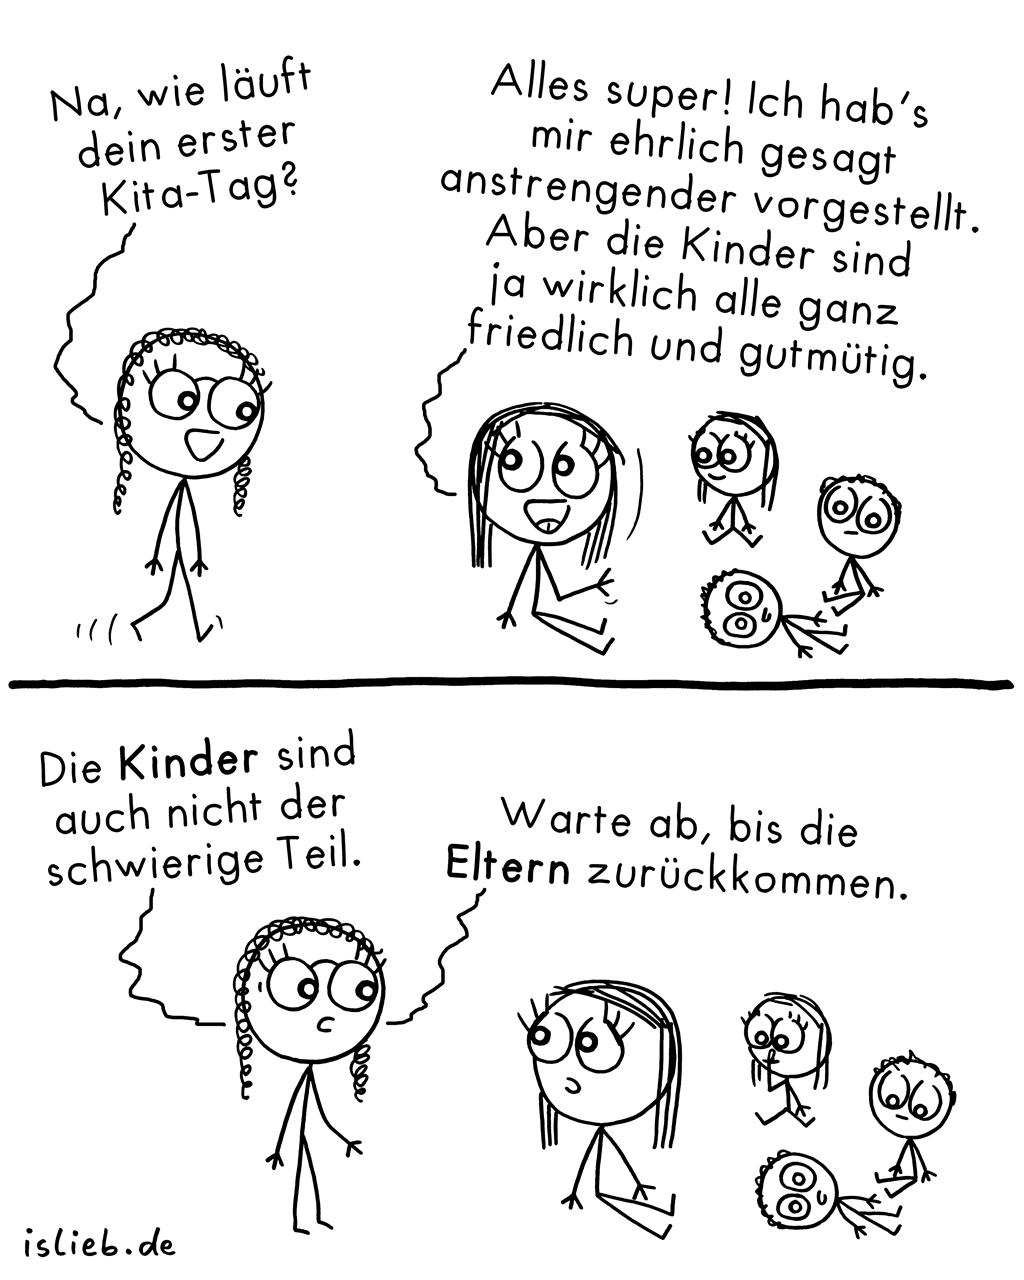 Kita | Strichmännchen-Comic | islieb